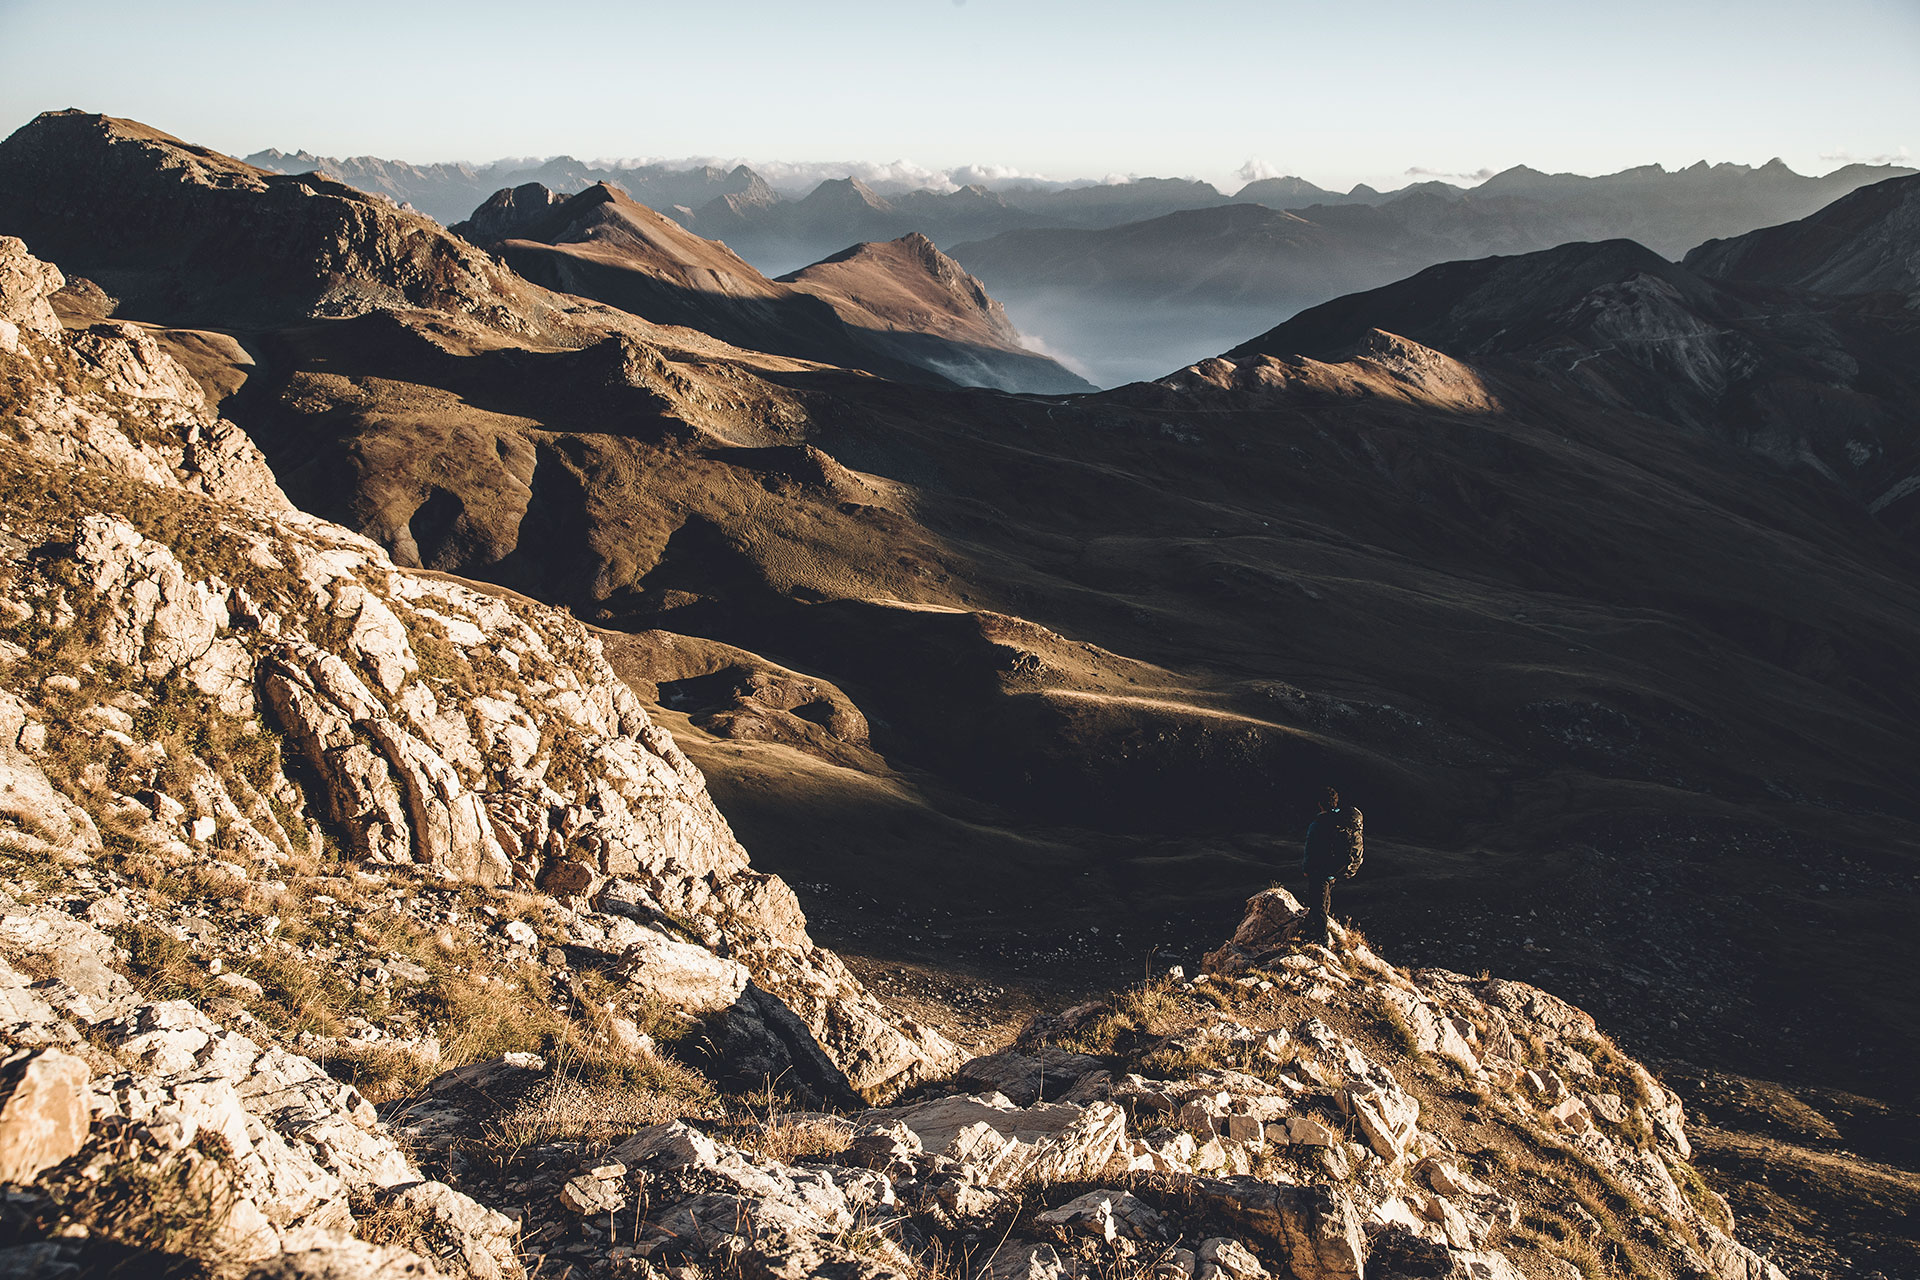 landschaft berge fotograf wandern bergsteigen trekking piemont alpen deutschland berlin